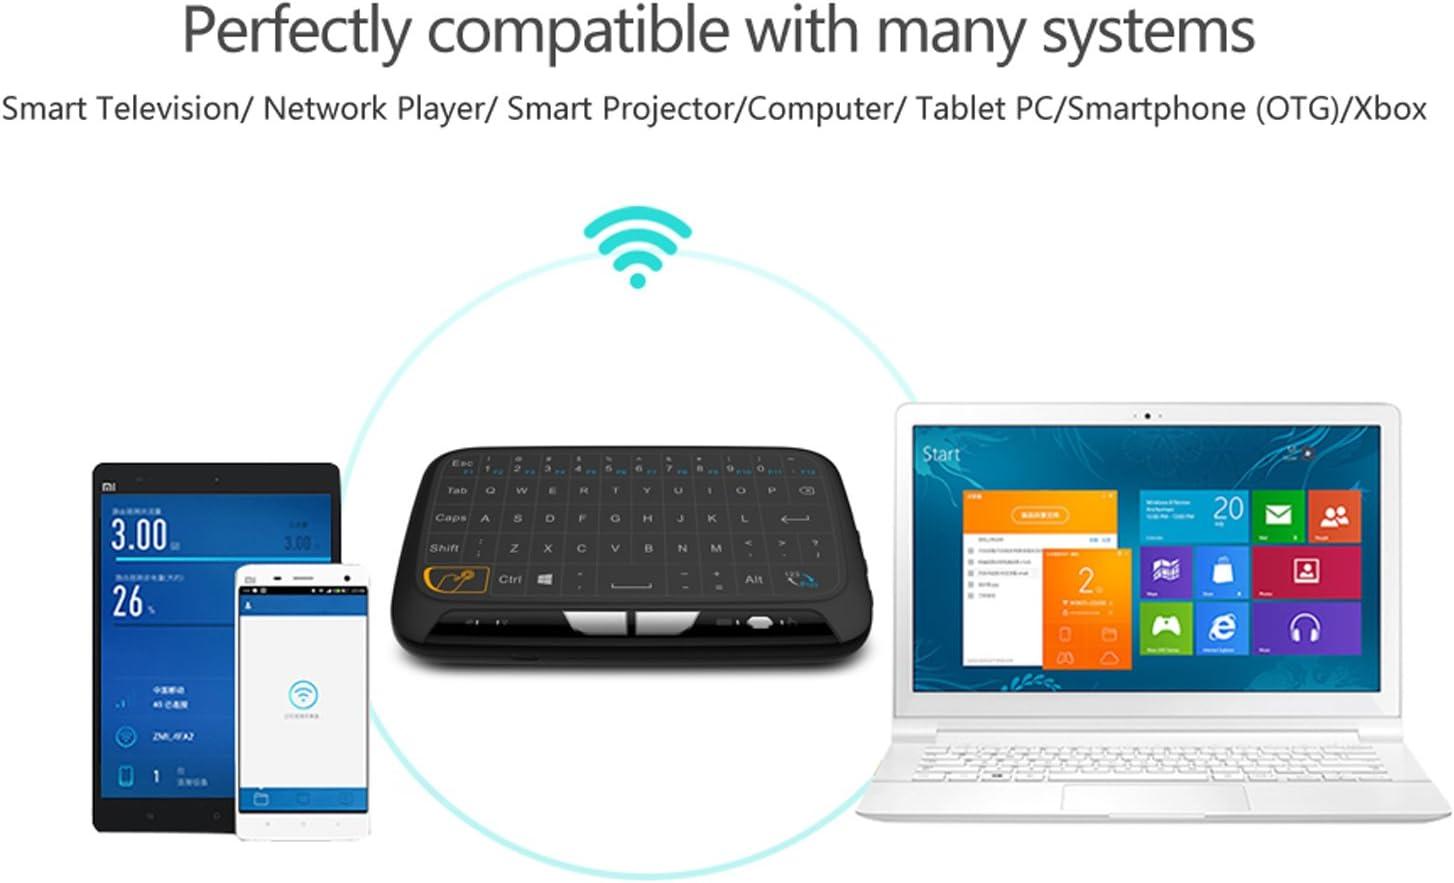 Mini inalámbrico ratón Touchpad y Teclado Combo, super-vip H18 toda Panel táctil de gran superficie múltiples dedos 2,4 G Wifi Mini Touchpad para Android TV Box, Windows PC, HTPC, IPTV, Raspberry Pi,